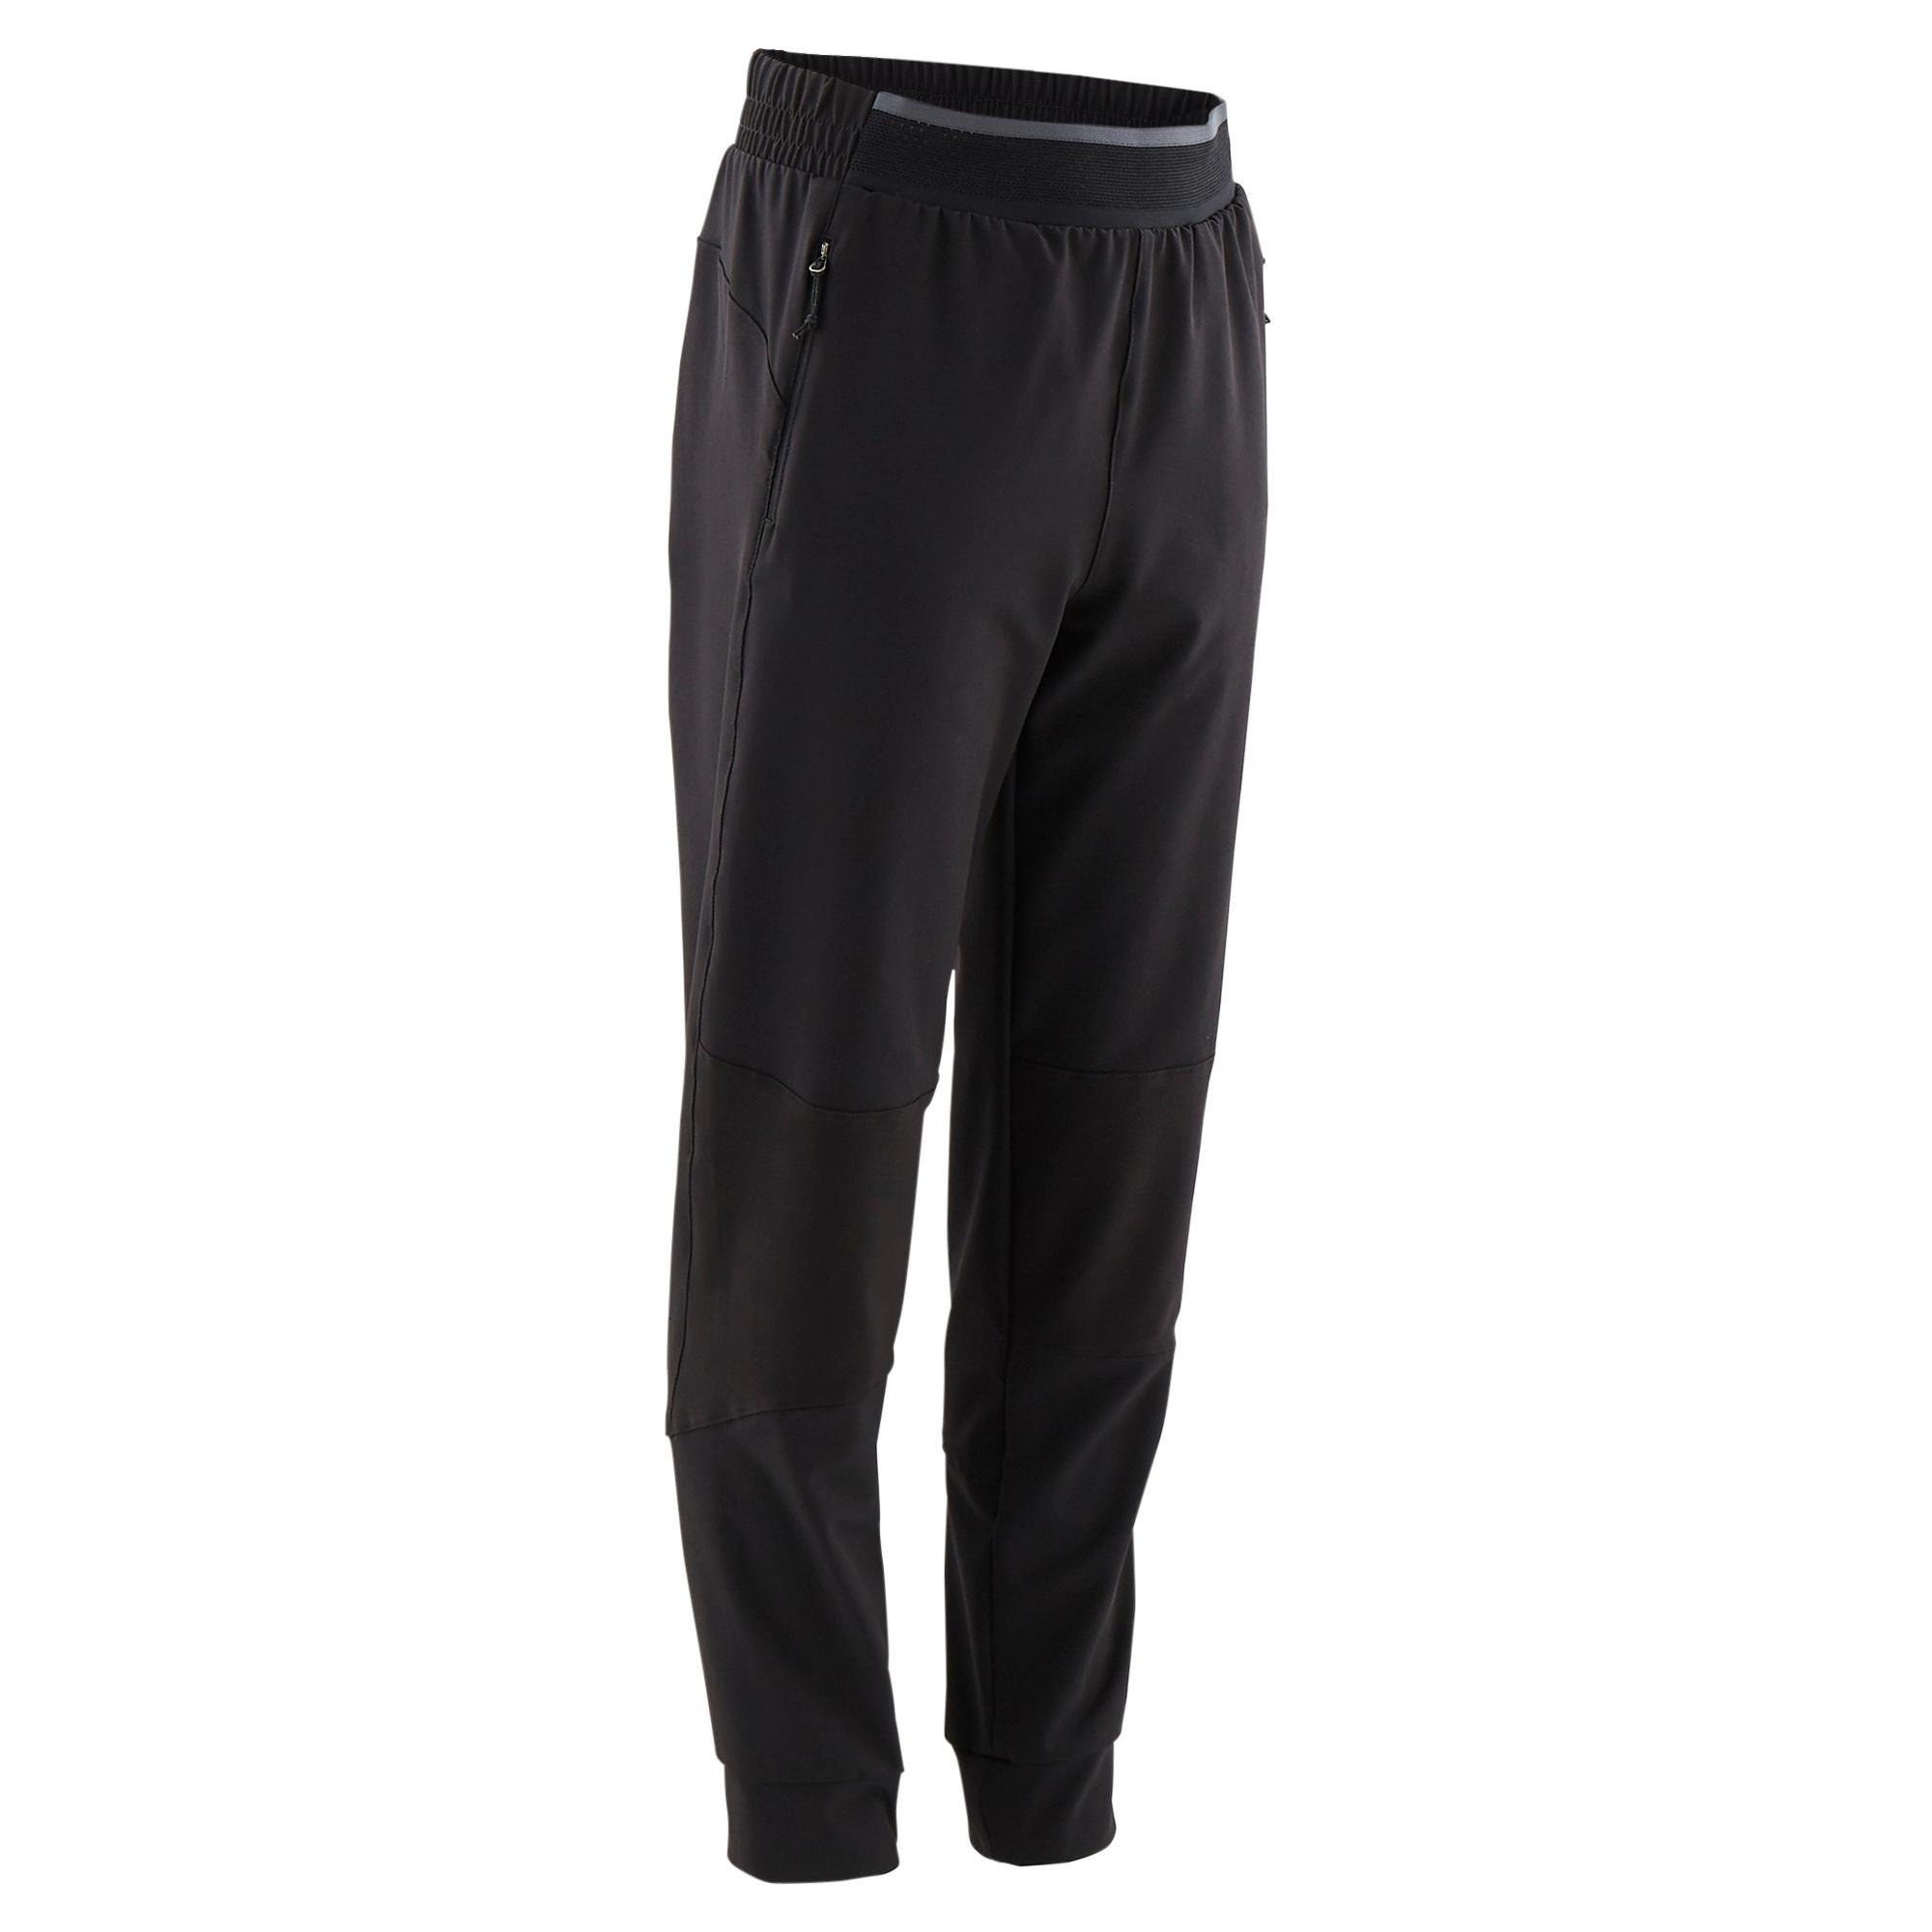 Pantalon W900 Negru băieți la Reducere poza